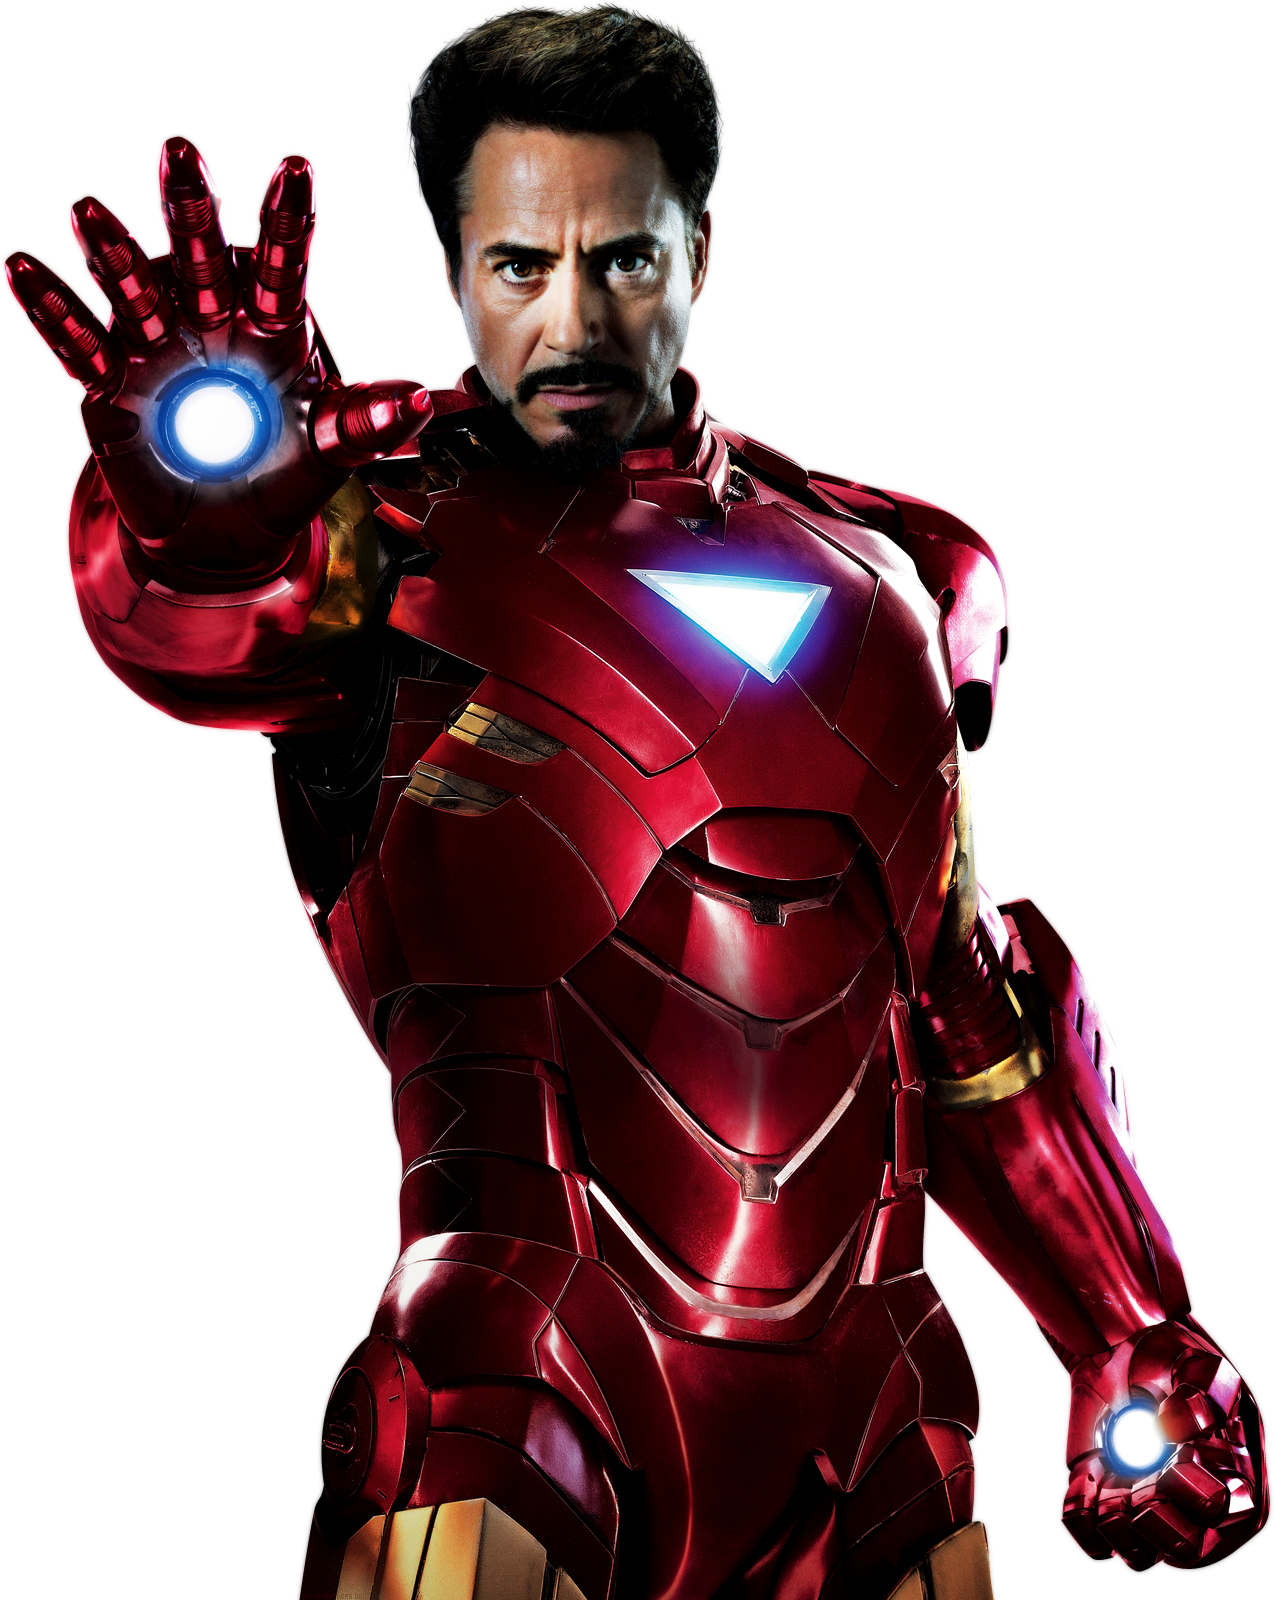 Iron Man Png Pic - Iron Man, Transparent background PNG HD thumbnail